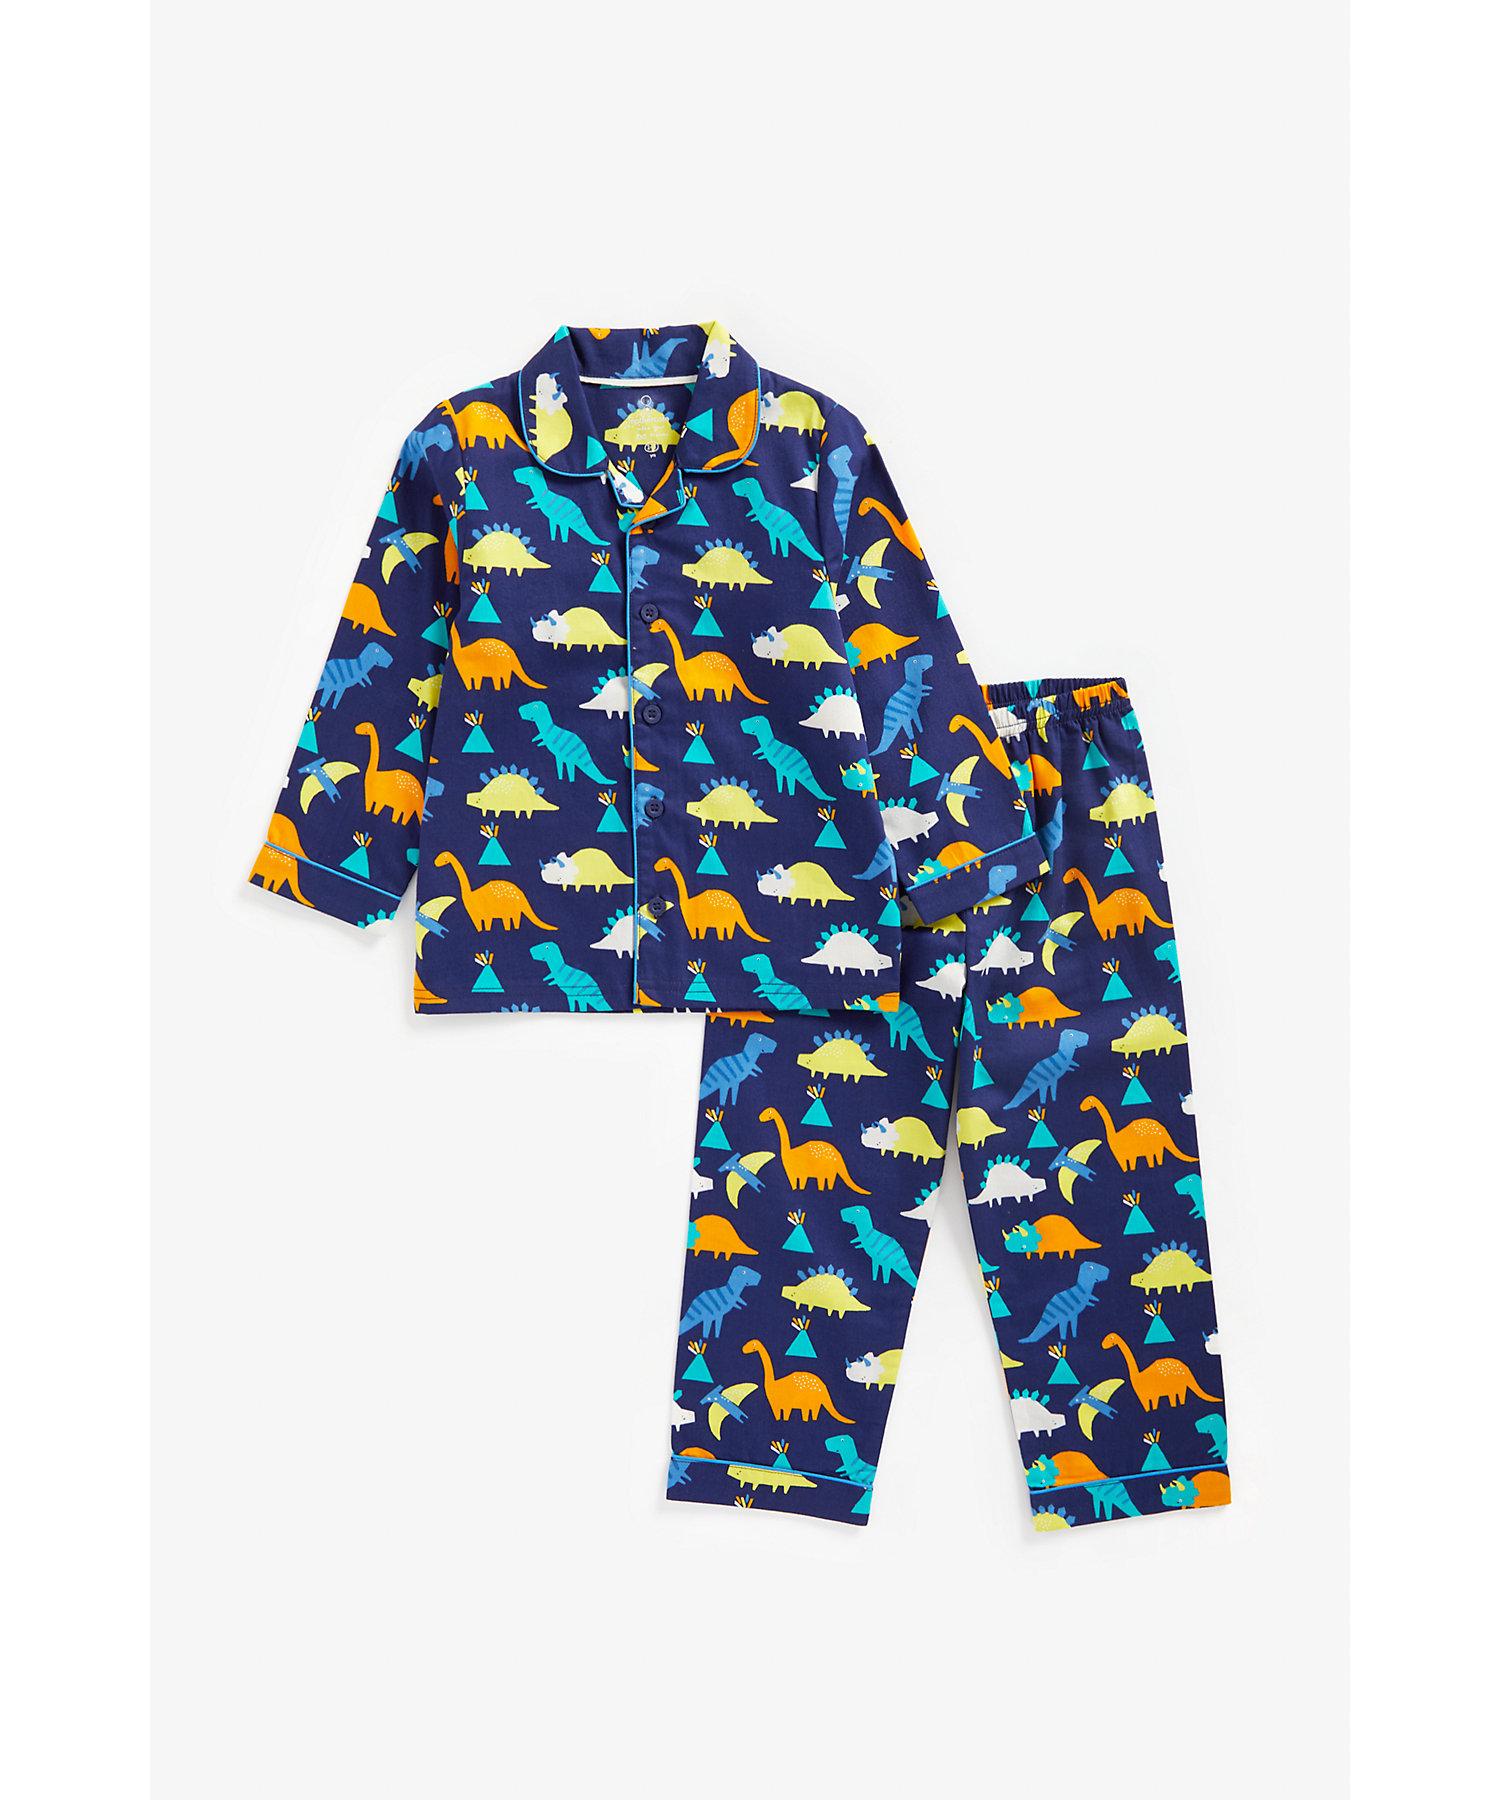 Mothercare | Boys Full Sleeves Pyjama Set Dino Print - Navy